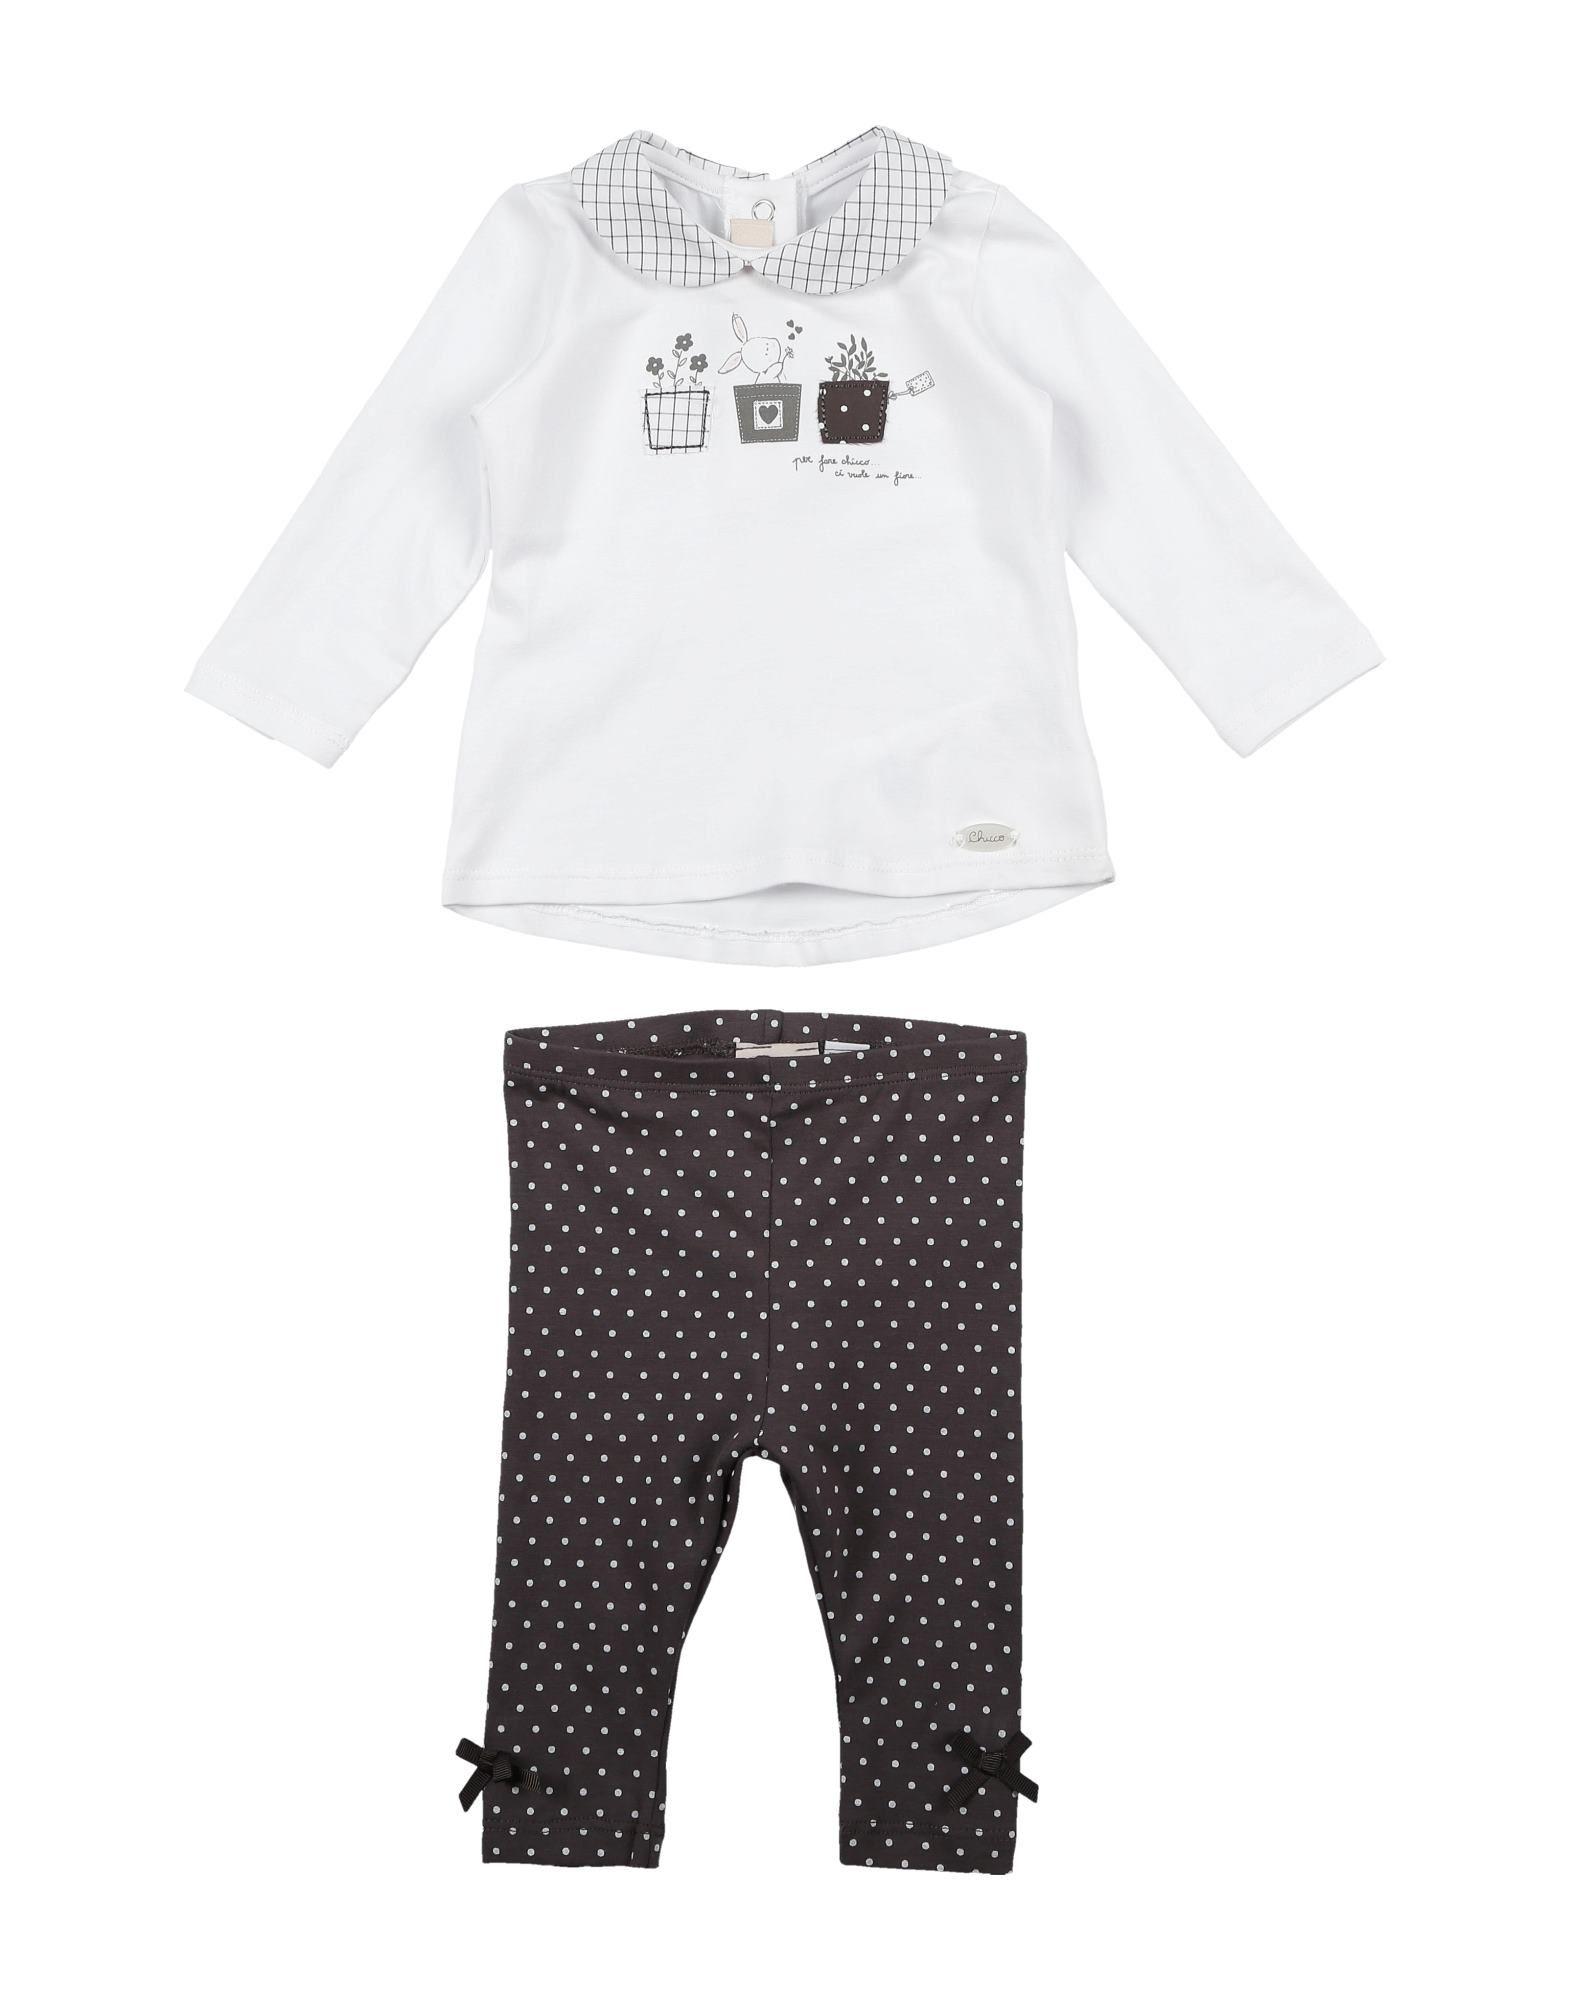 e2c04fd90a2 Casual Σύνολο Kορίτσι Chicco 0-24 μηνών - Παιδικά ρούχα στο YOOX